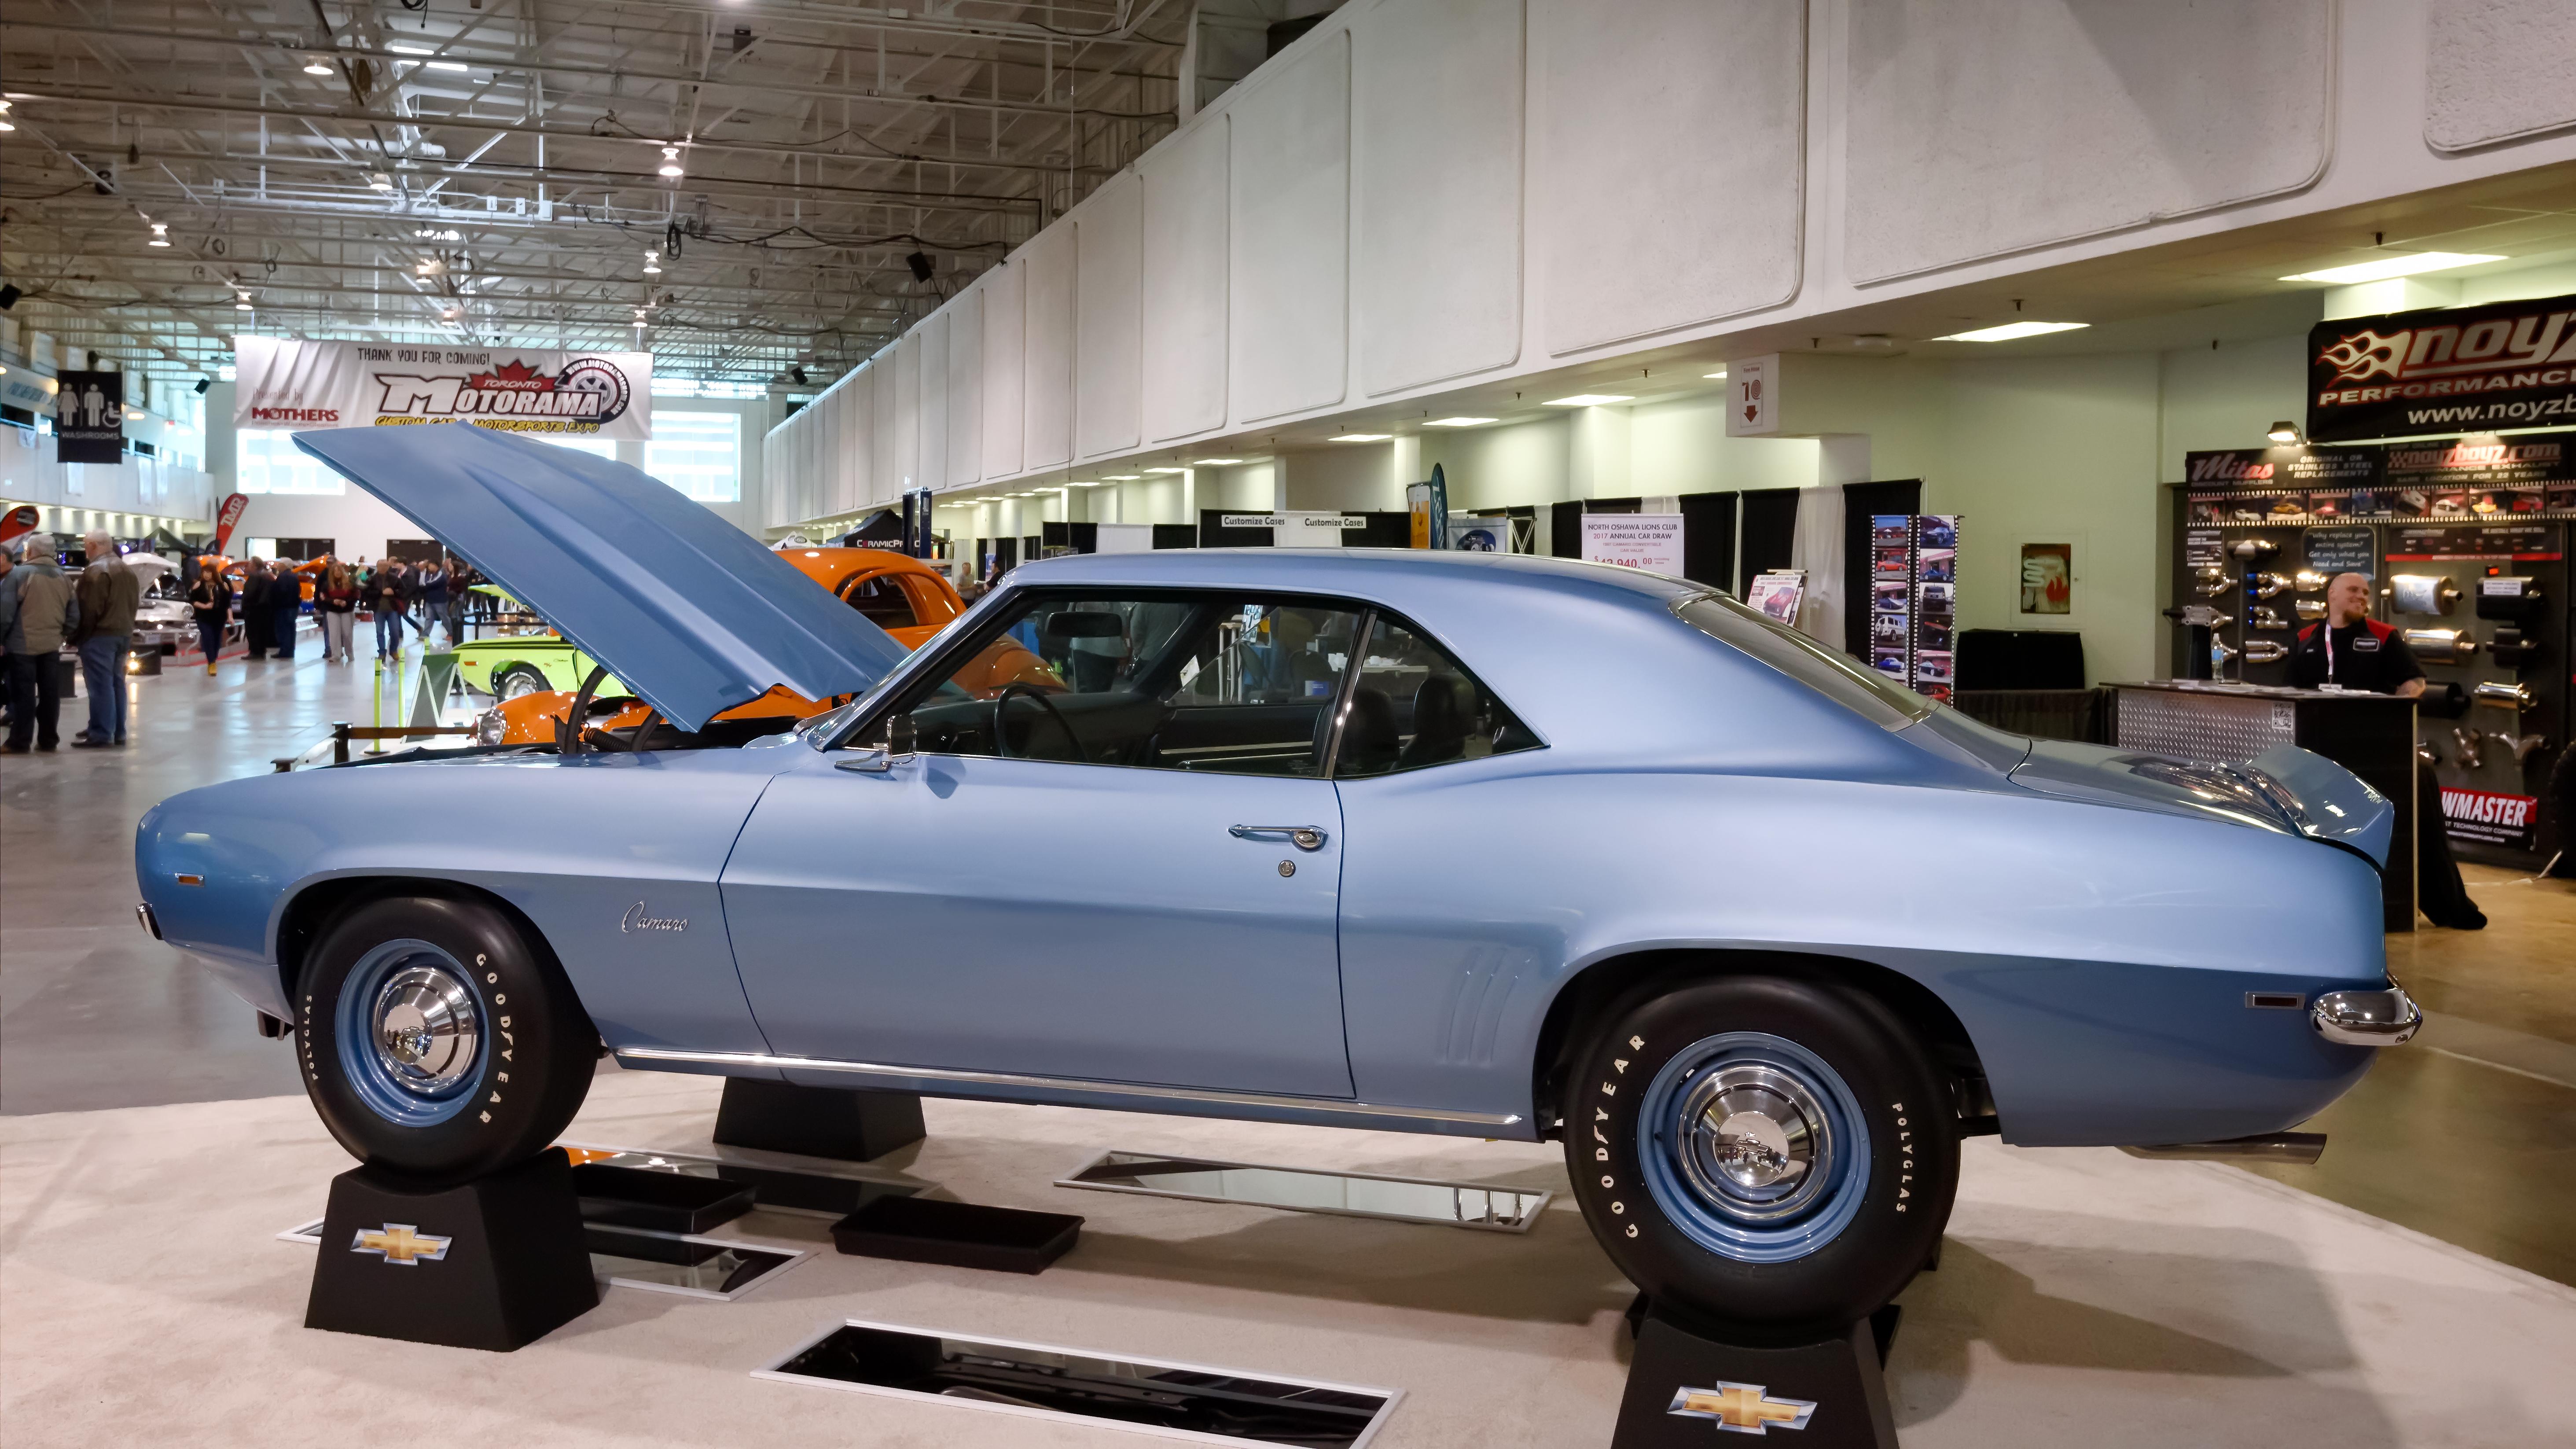 1969 COPO Camaro replica, 2017, Blue, Camaro, Car, HQ Photo